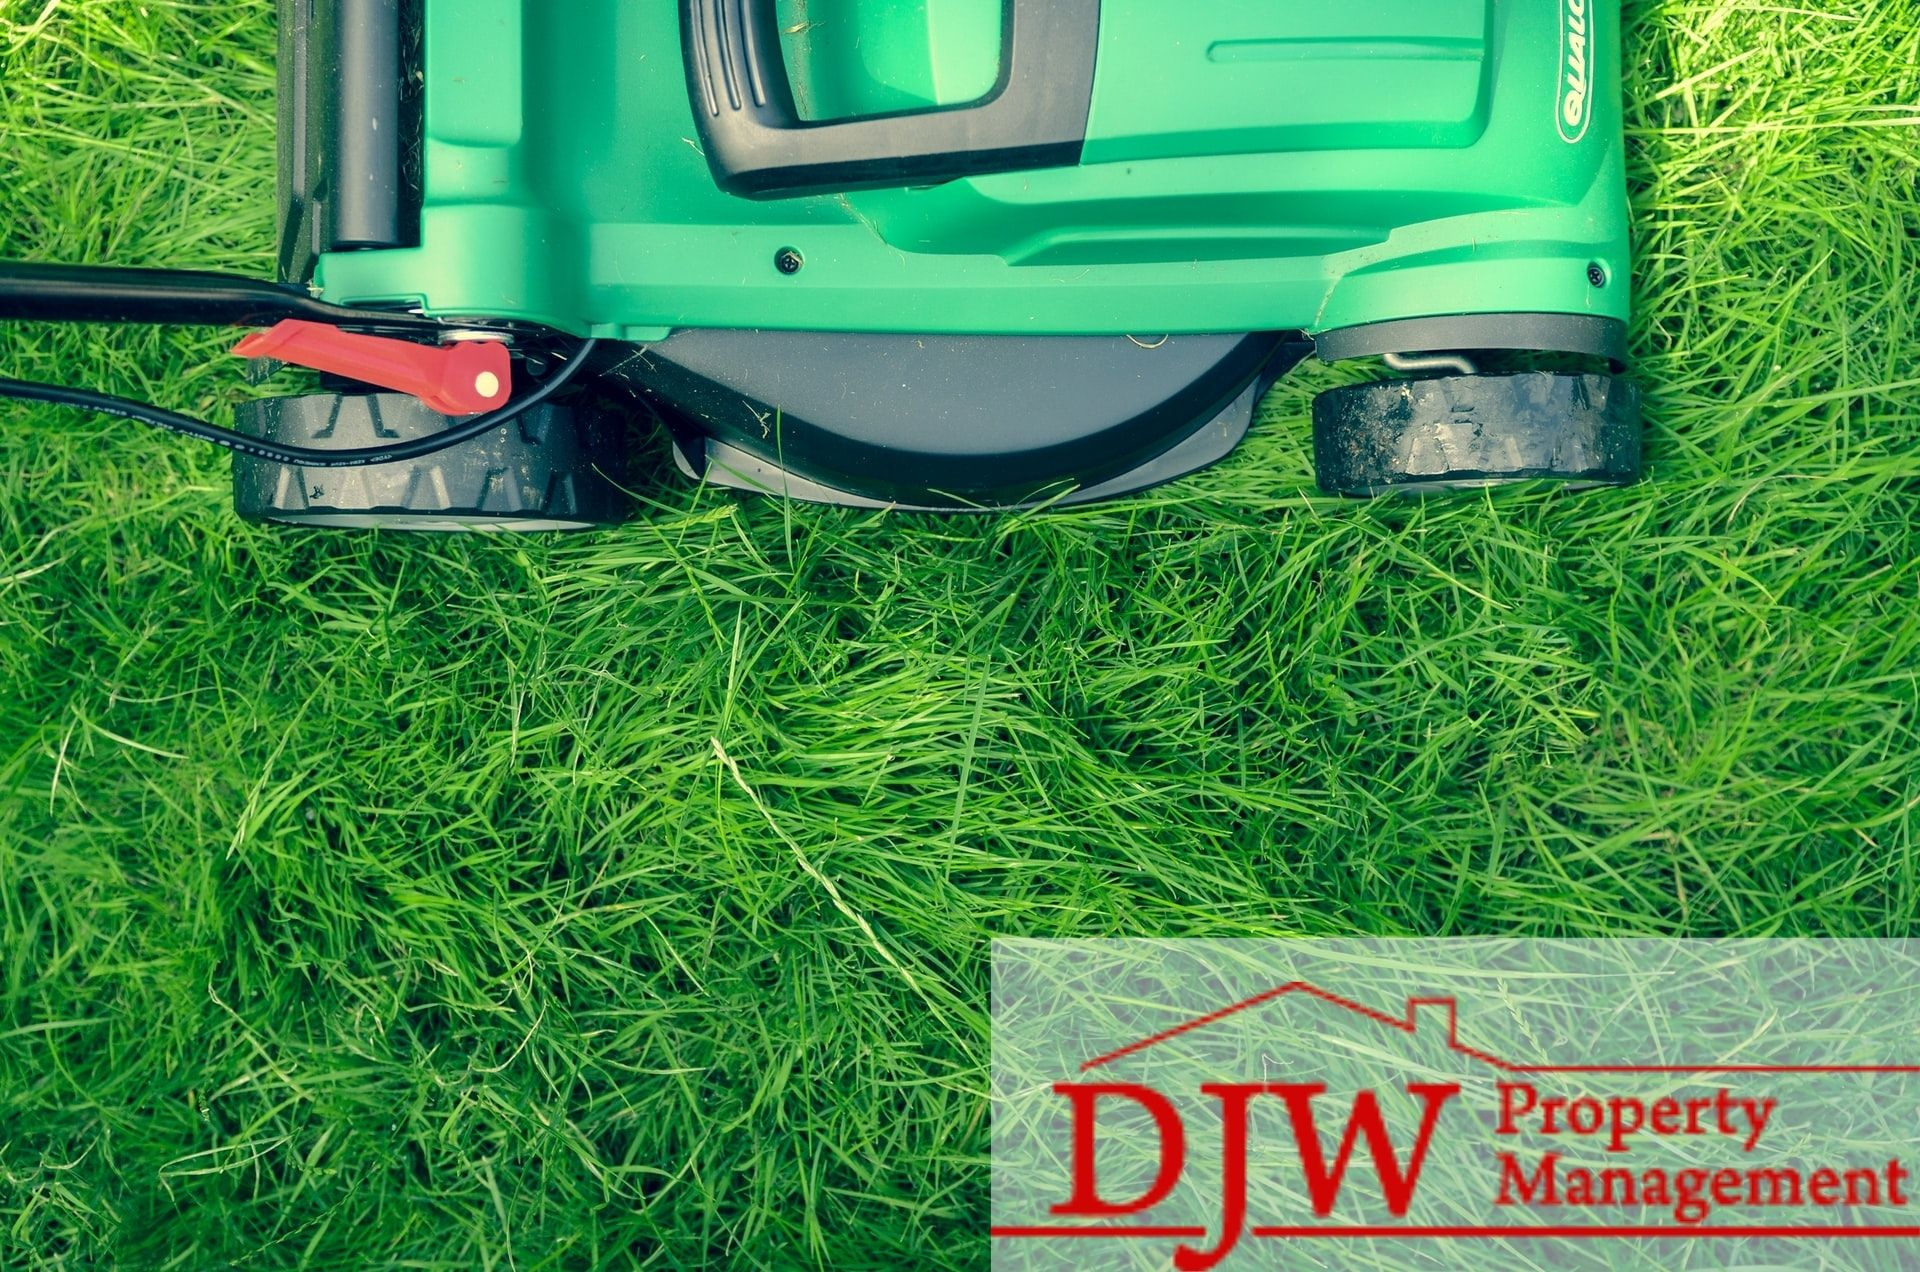 Black and green lawn mower cutting green grass.